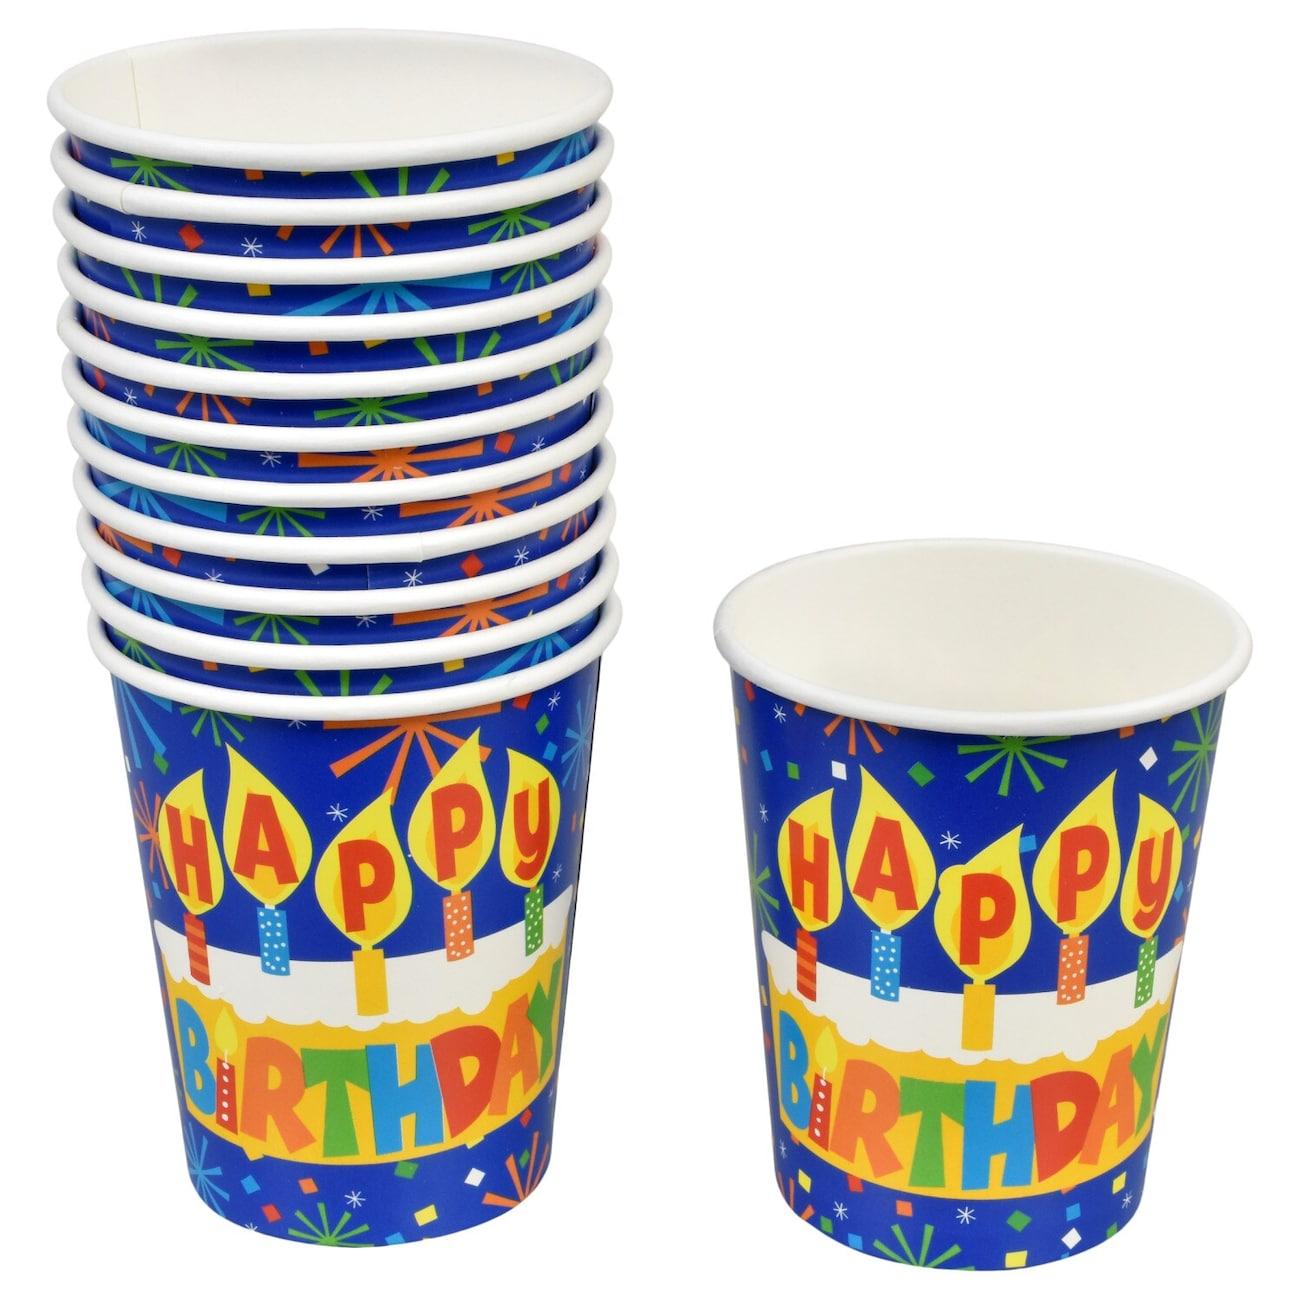 3 Oz Paper Cups - Dollar Tree, Inc